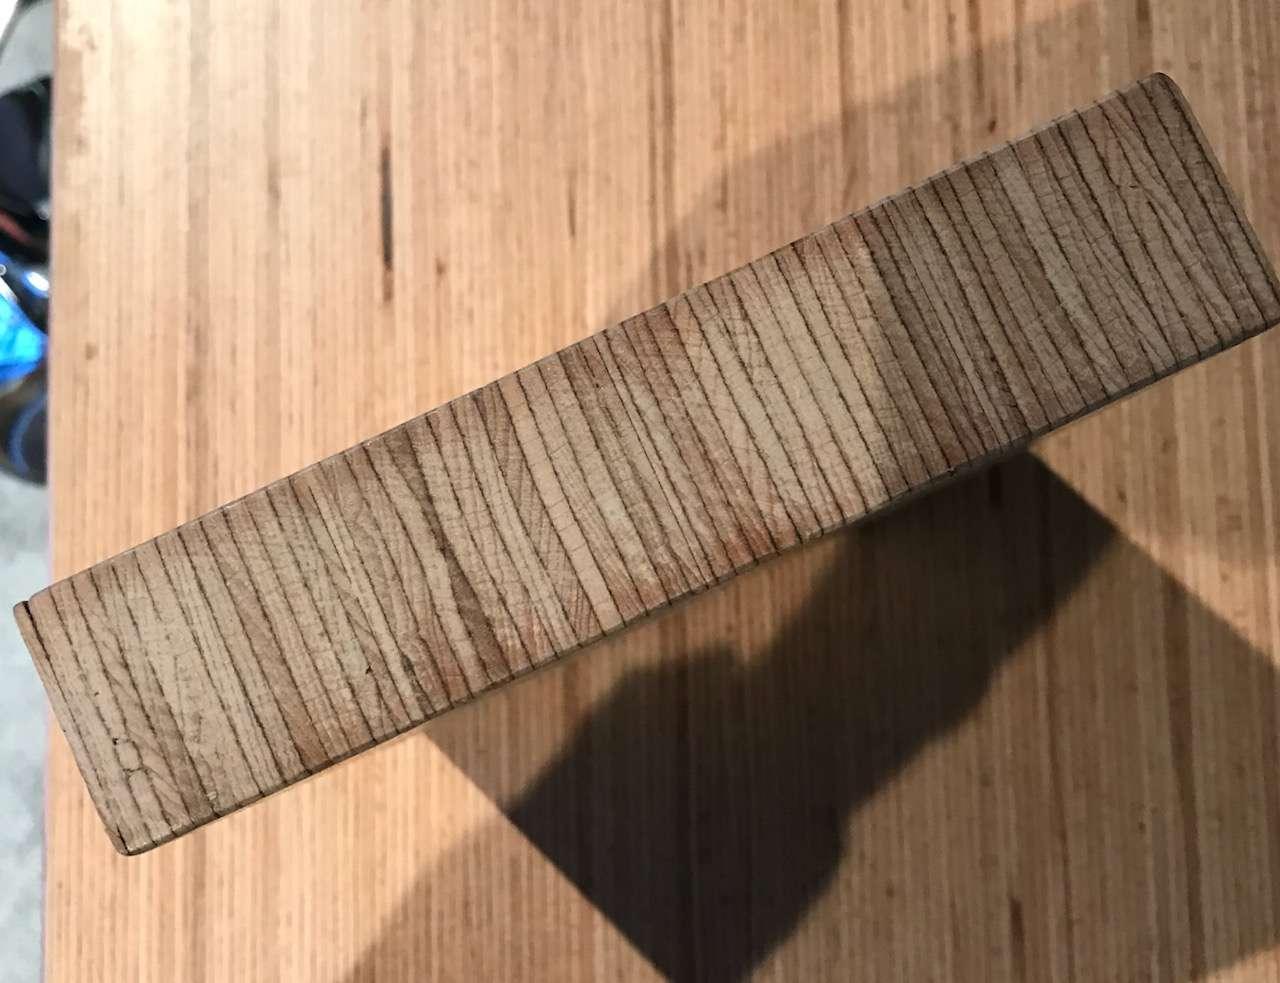 Laminated veneer lumber sample piece